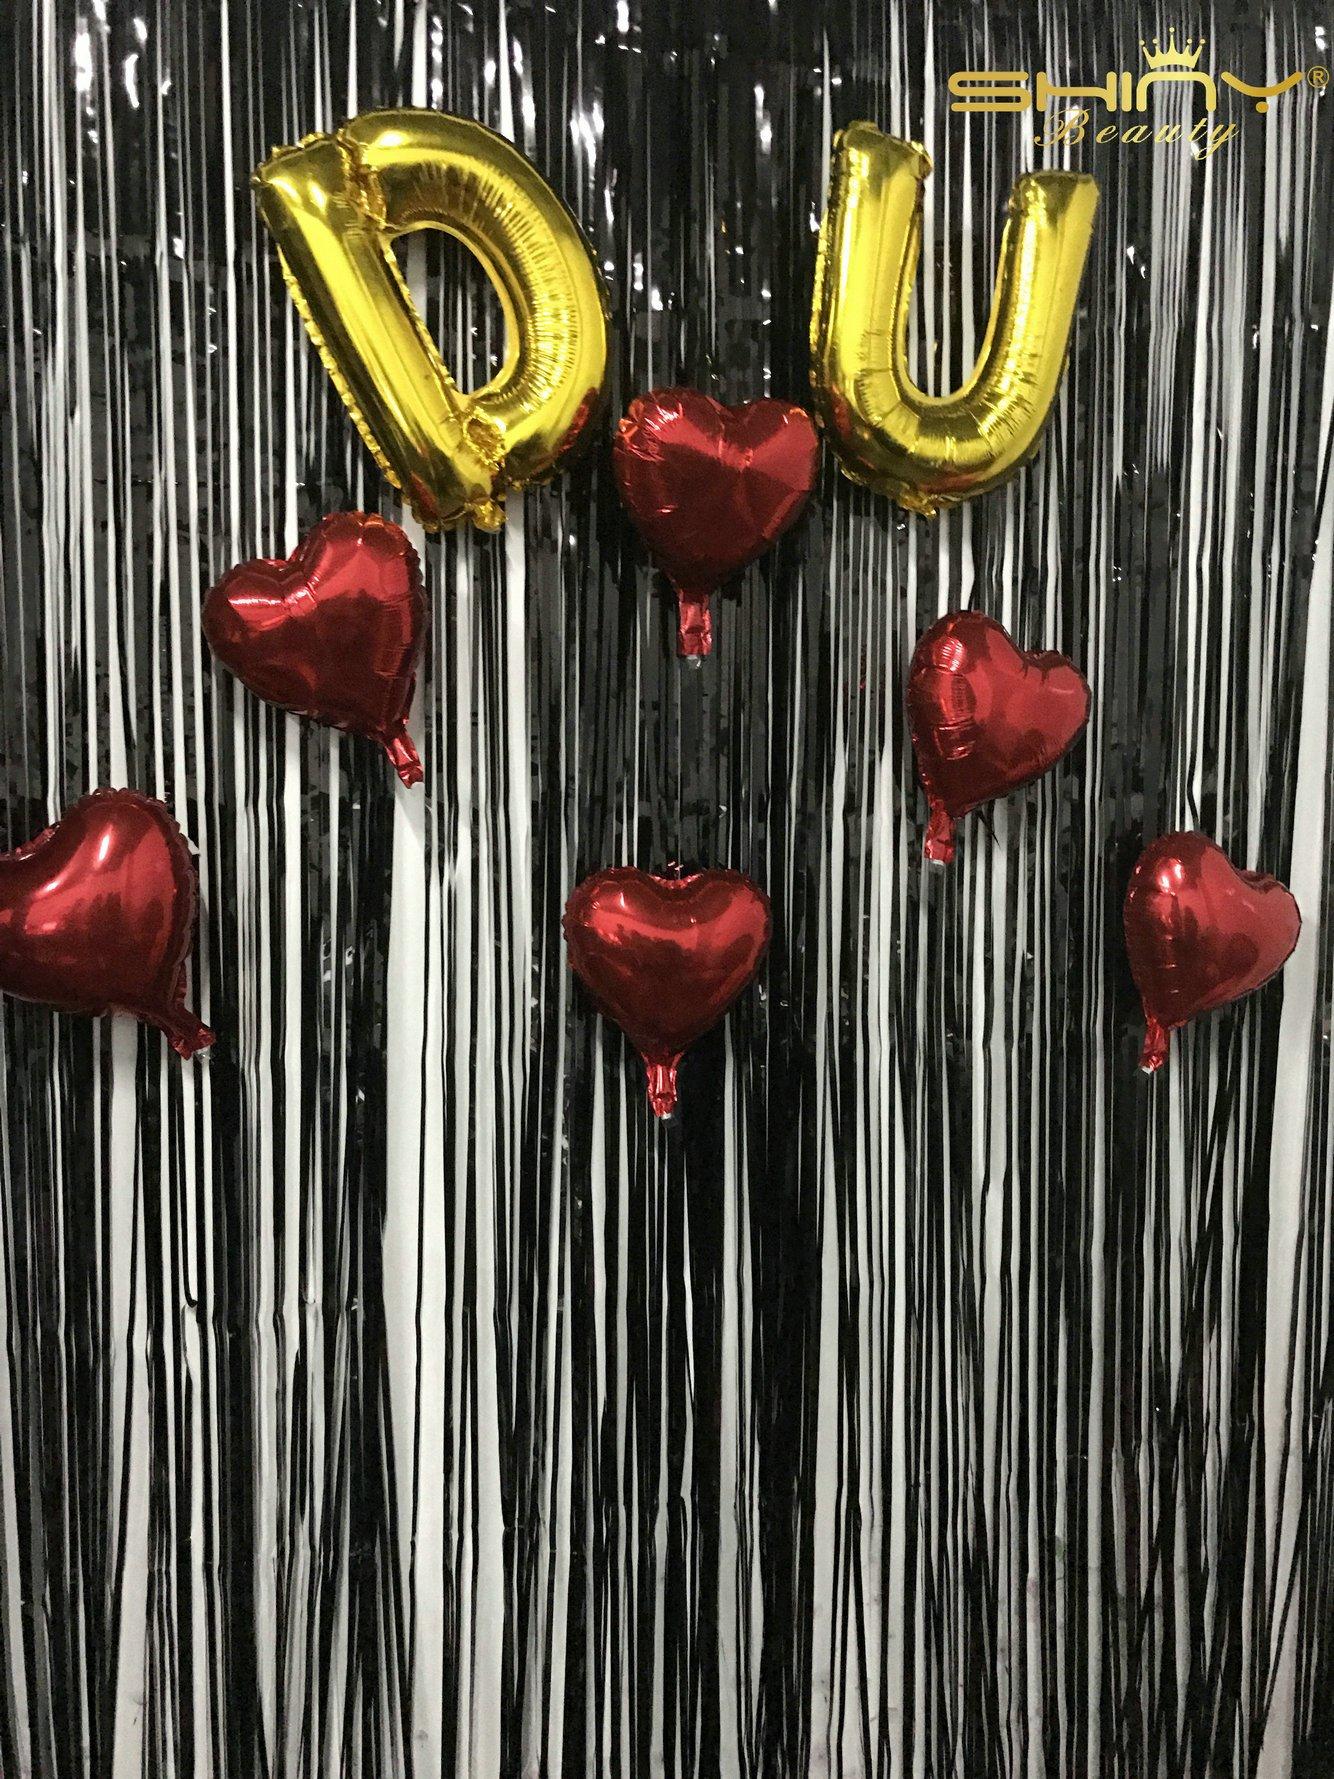 ShinyBeauty 9FTX10FT-Black Foil Fringe Door,Shimmering Look Fundraisers Proms,Metallic Foil Fringe Curtains